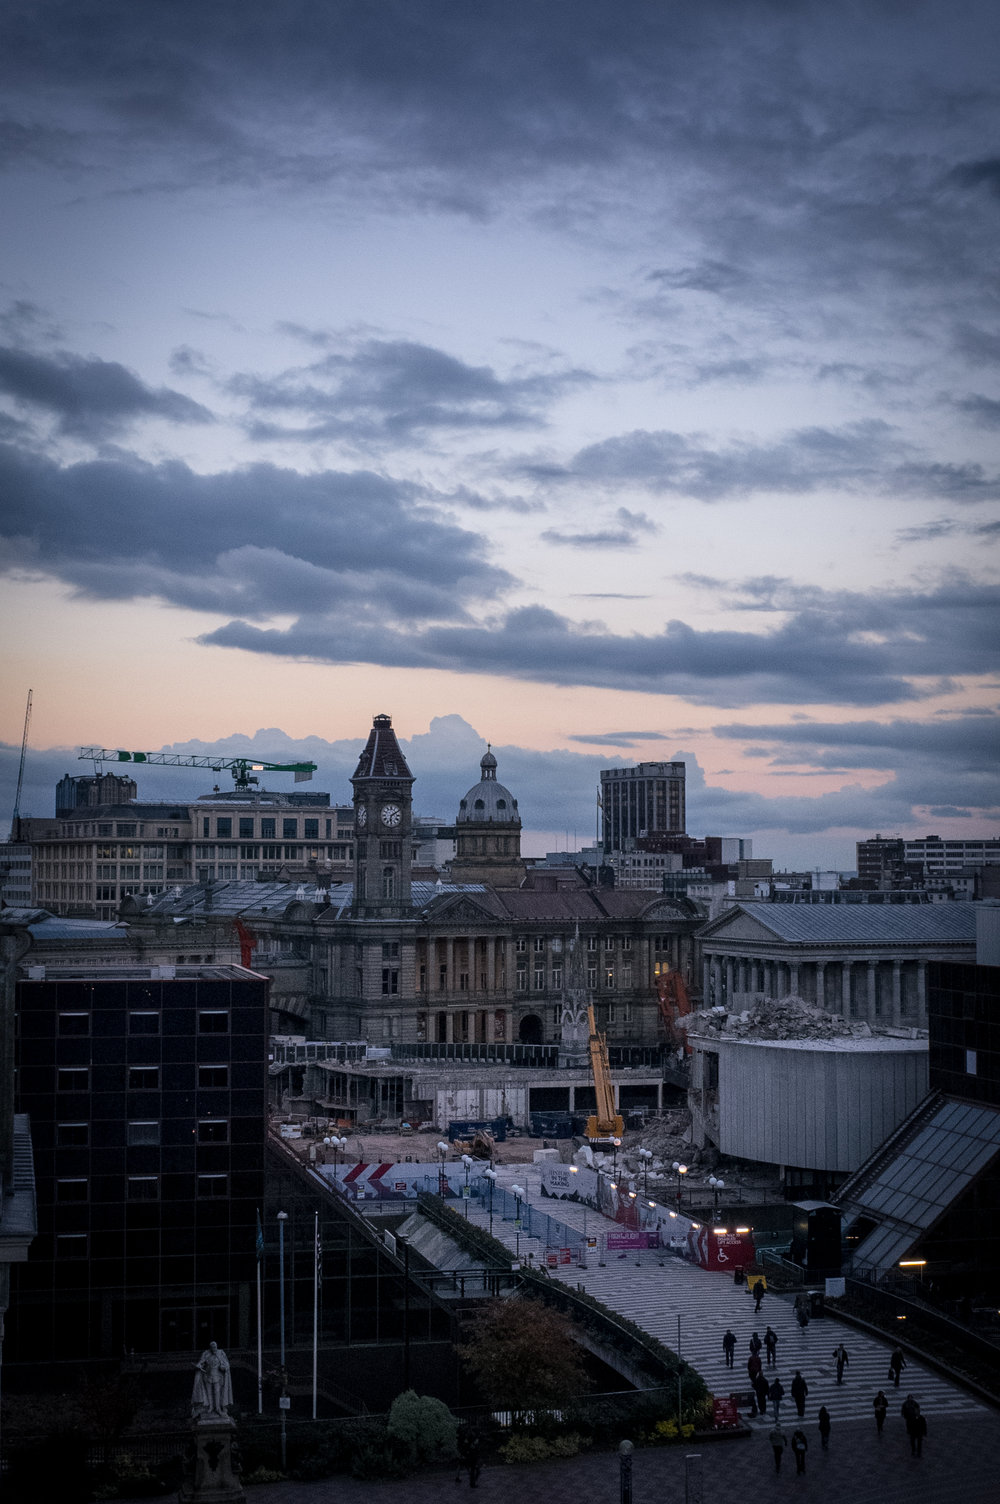 Birmingham Museum & Art Gallery - Clifford Darby 2016